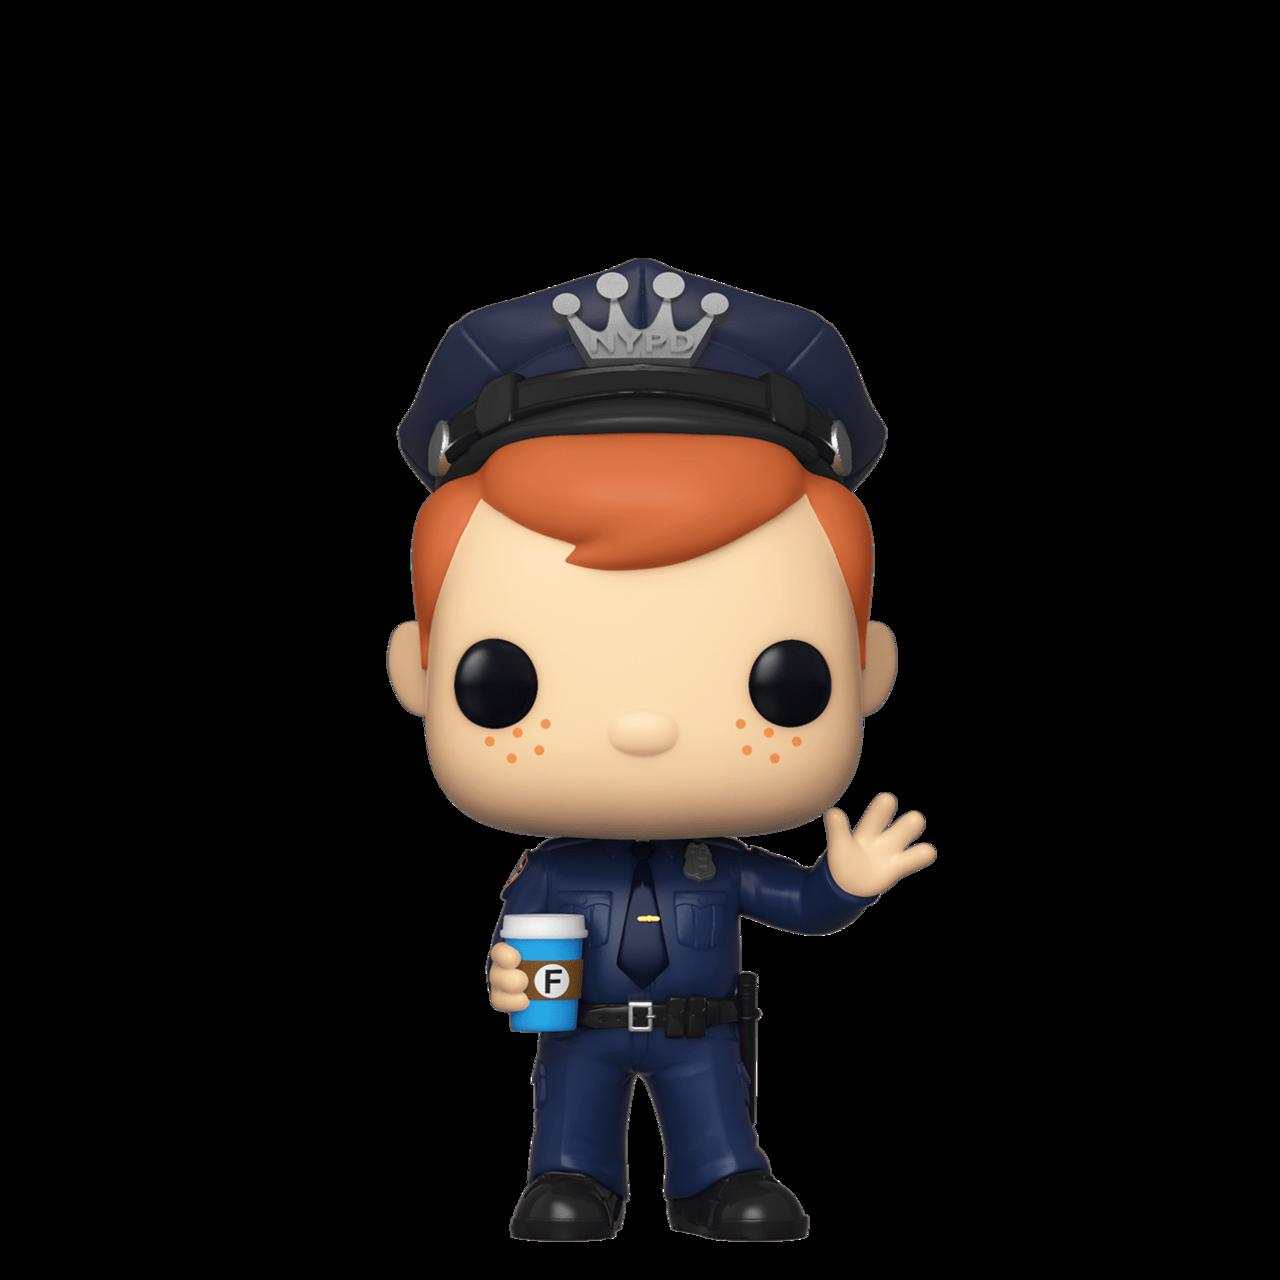 Officer Freddy